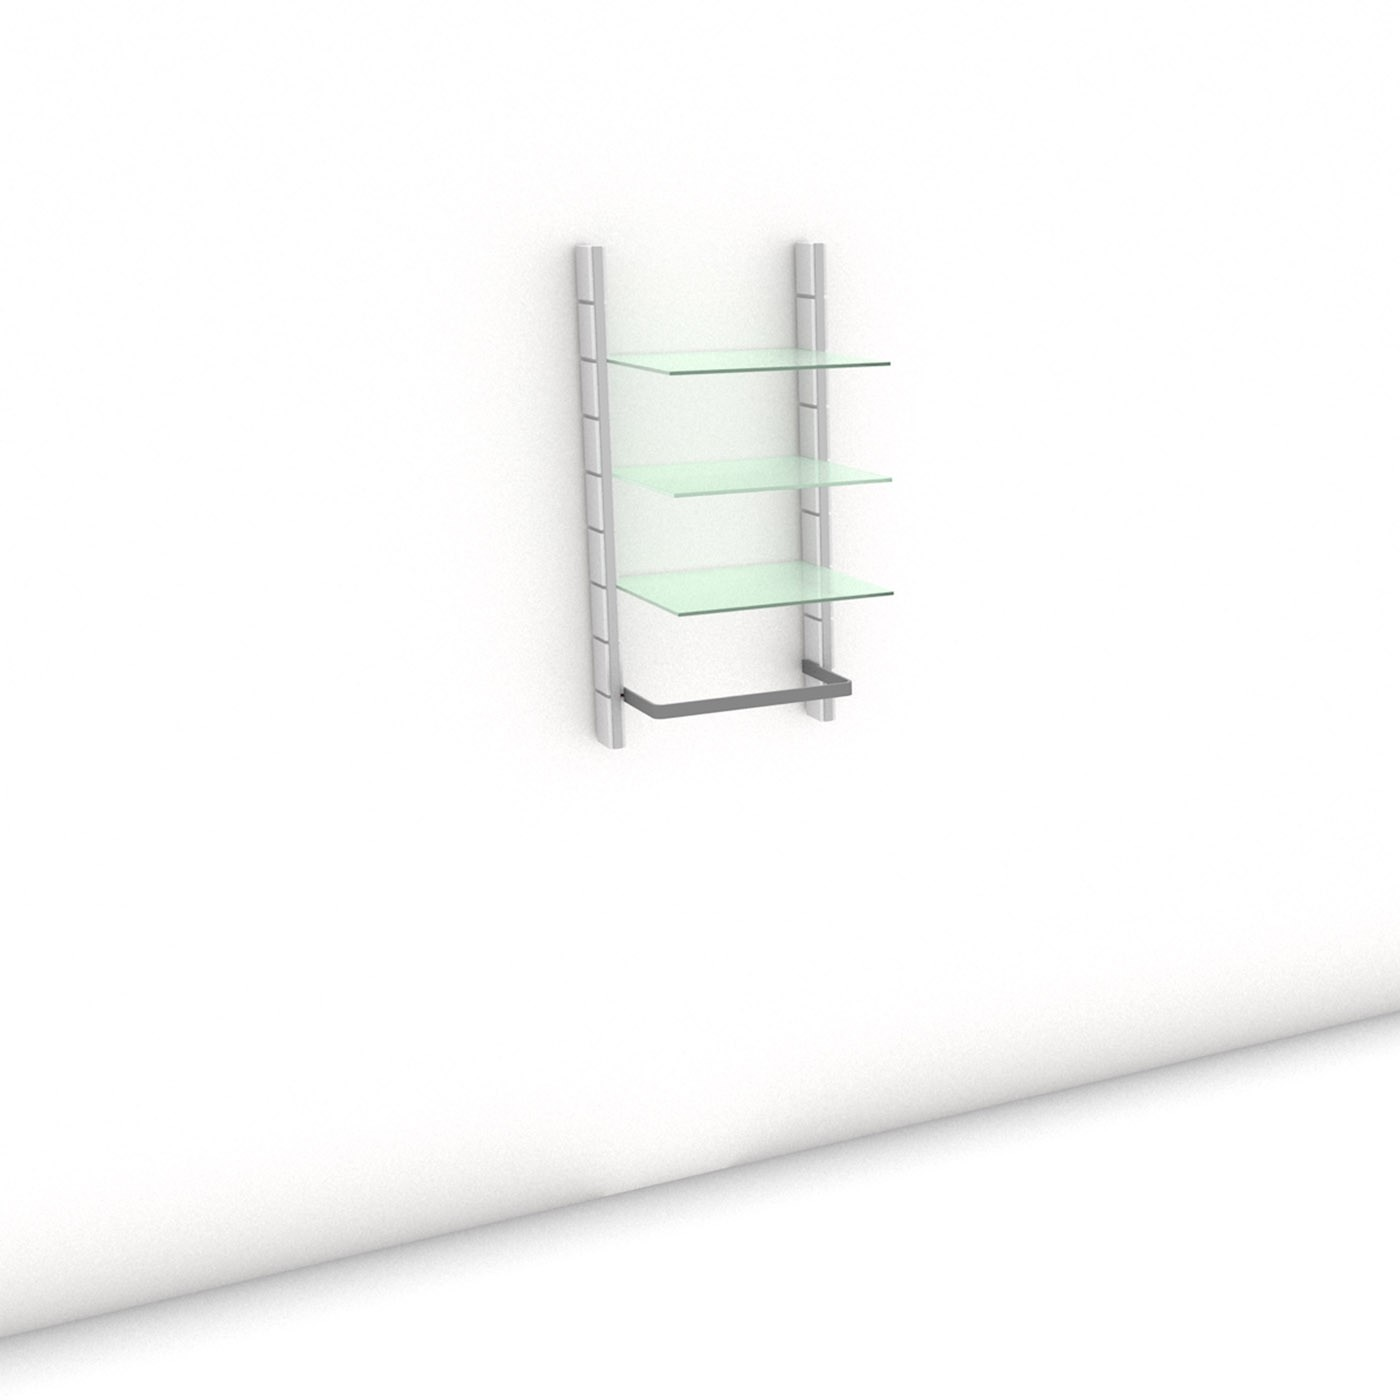 Begehbarer Kleiderschrank - Comfort (M) 54 -  Maß: 54 x 107,2 x 45 cm (B x H x T)